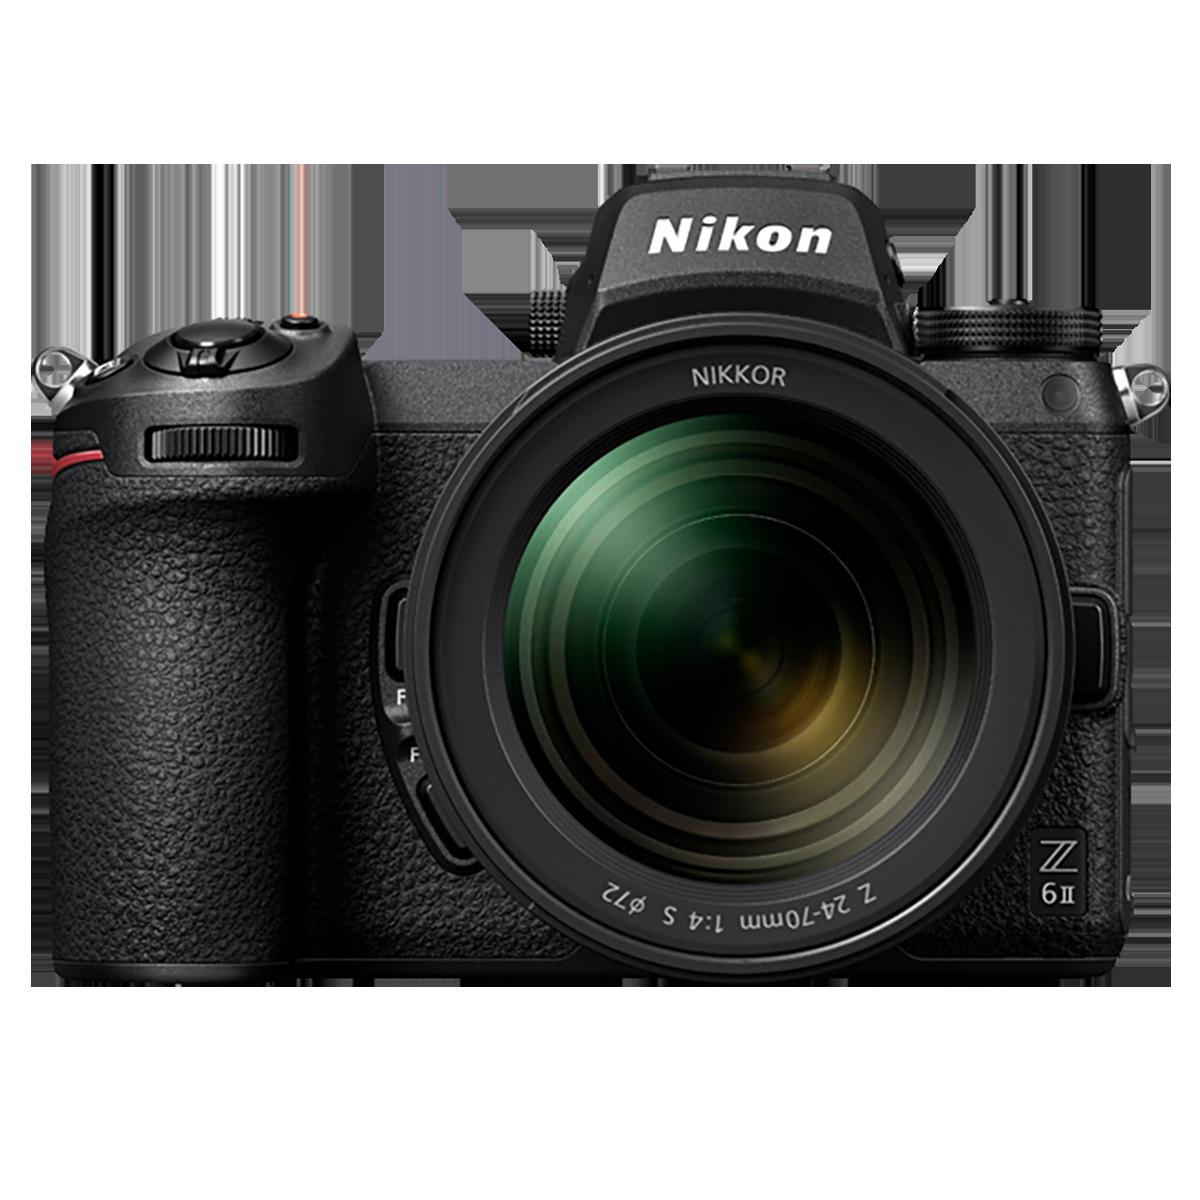 Nikon Z 6II 24.5 MP Mirrorless Camera (24-70 mm, Dual EXPEED 6 Image Processors, VOK060XN, Black)_1